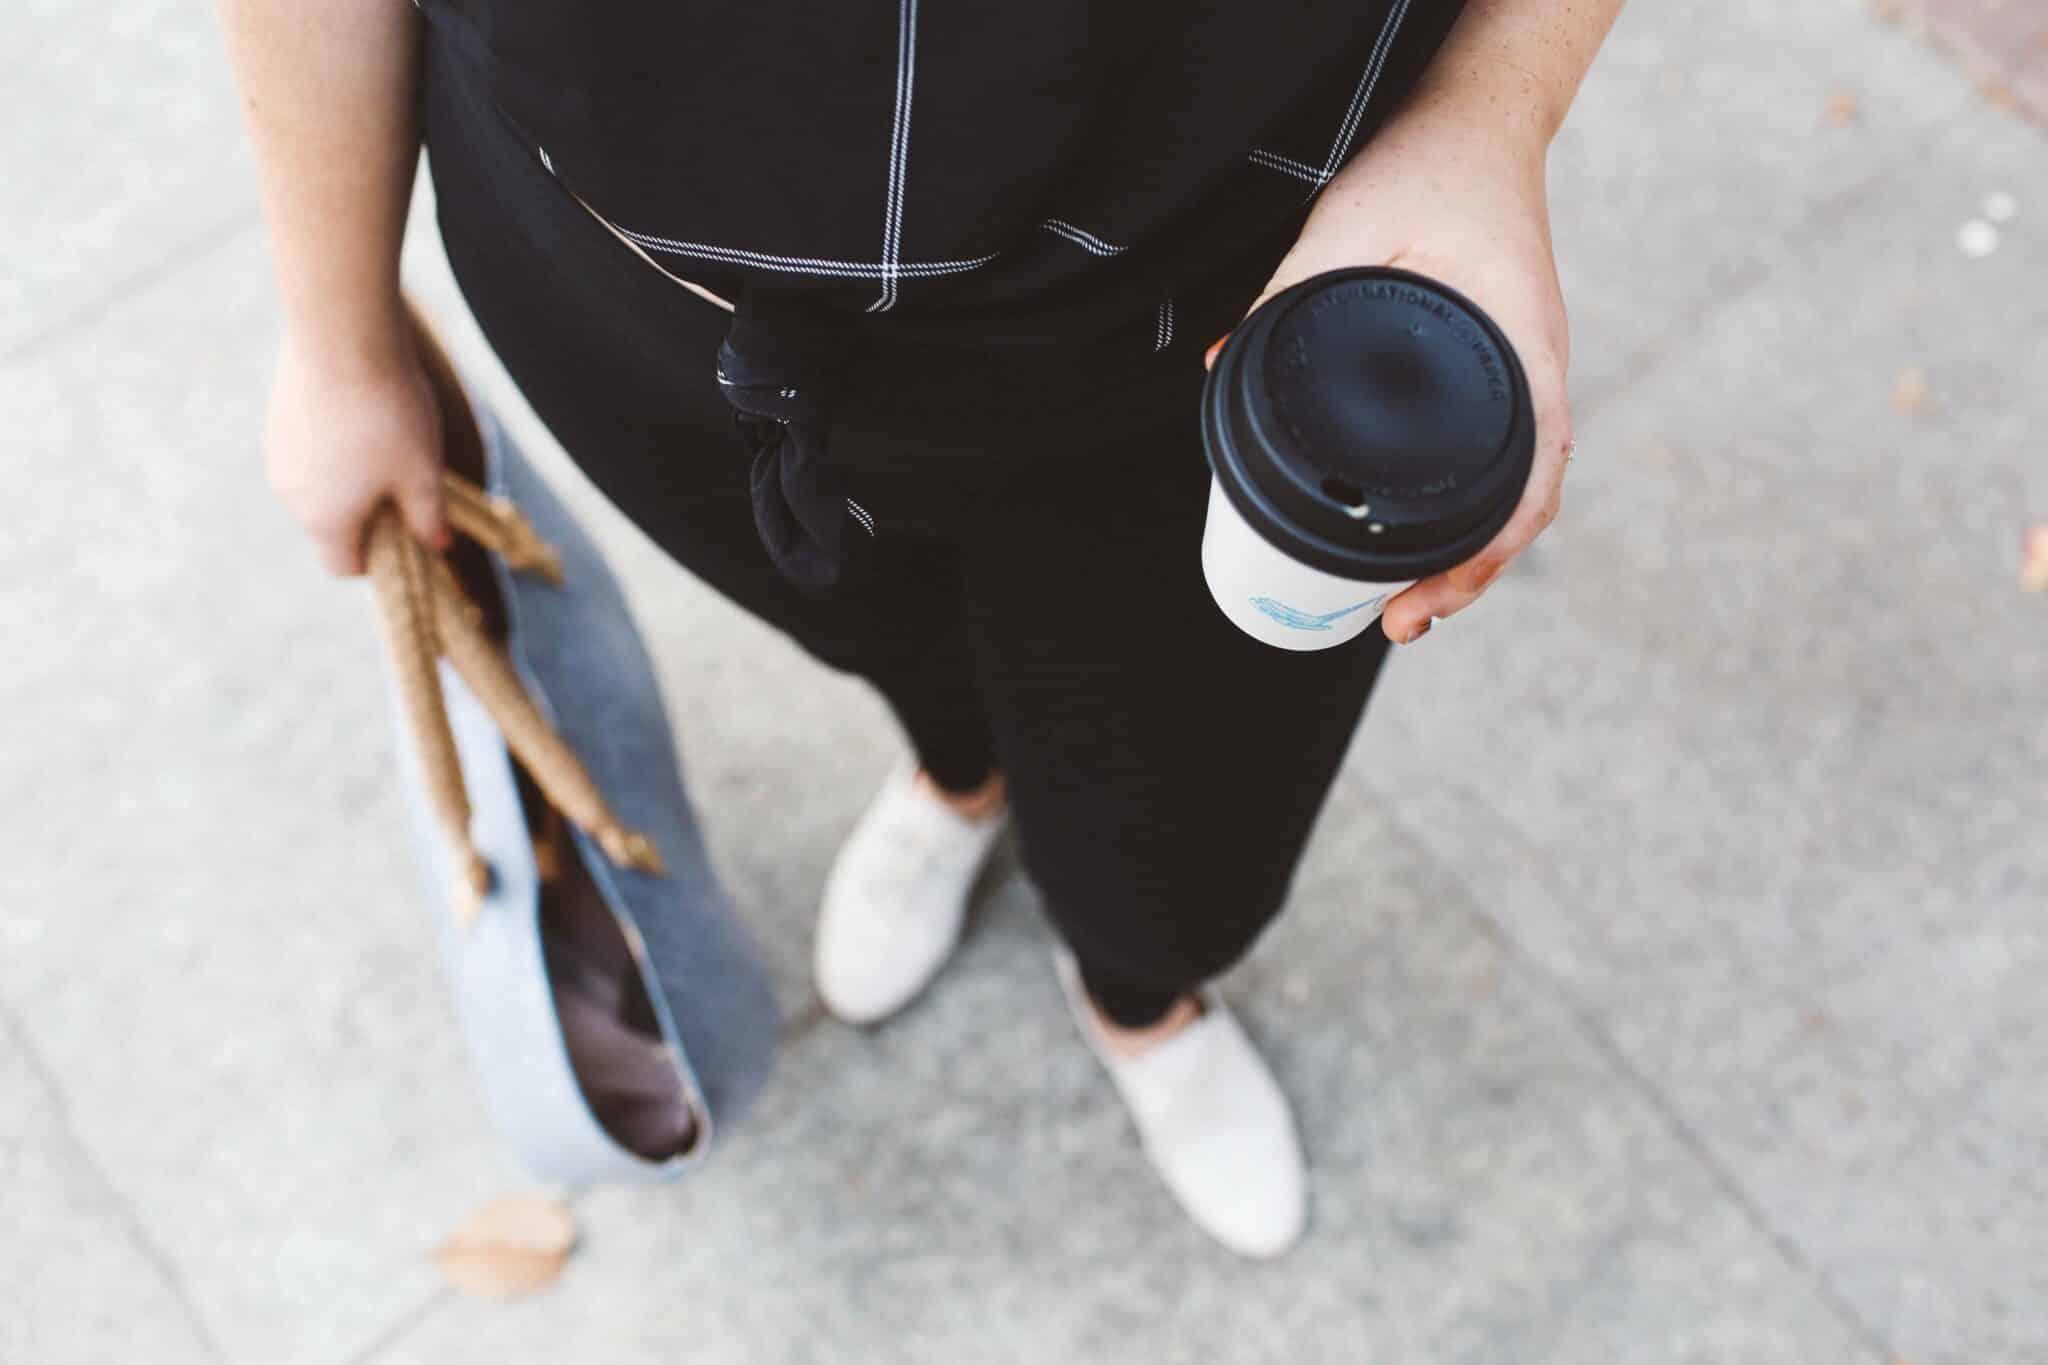 holding coffee